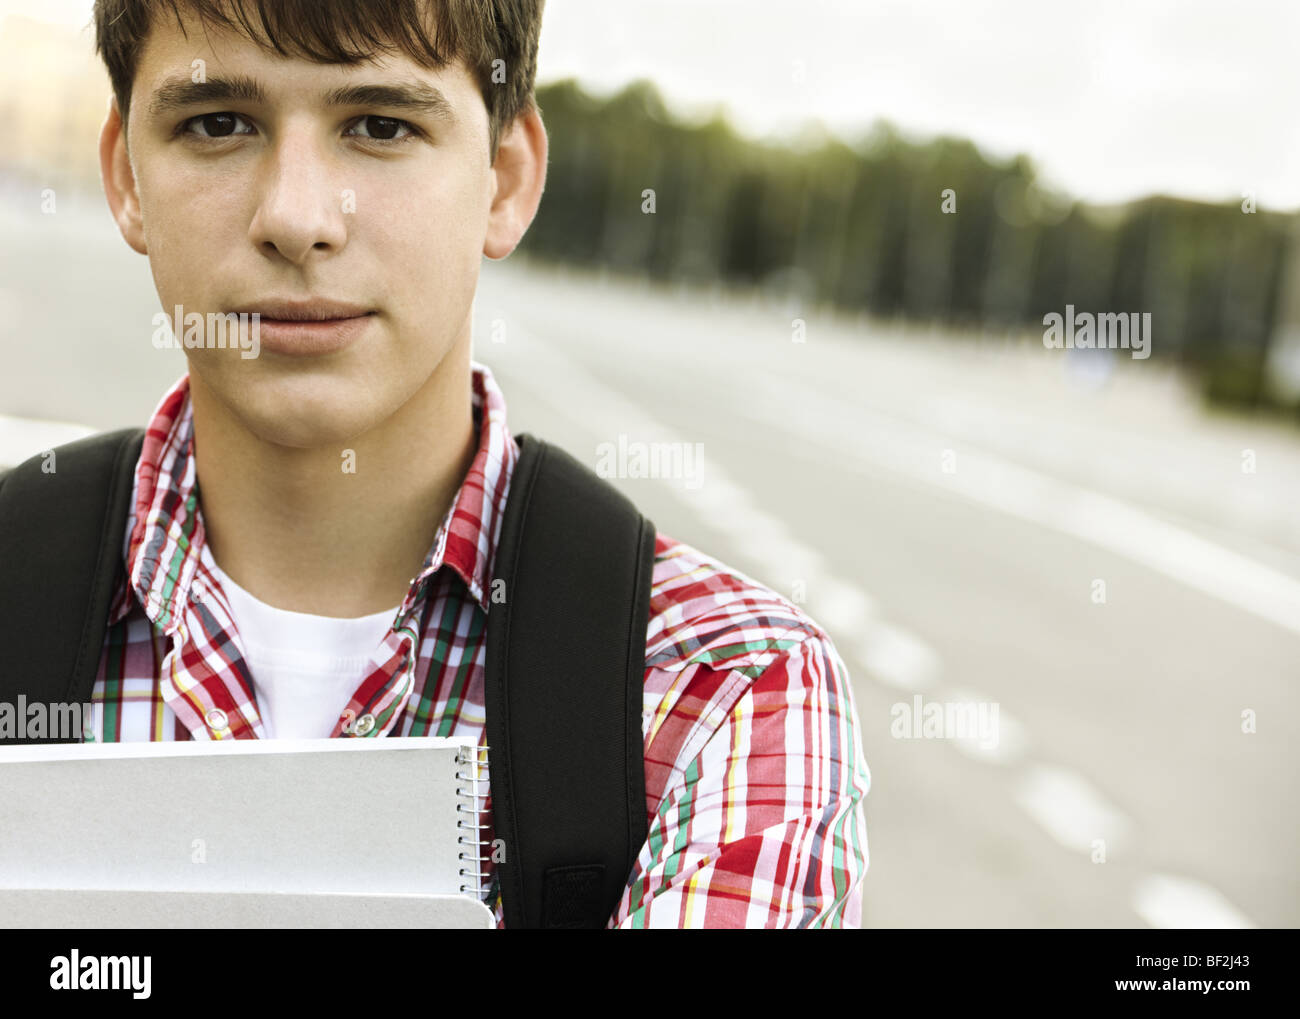 student - Stock Image